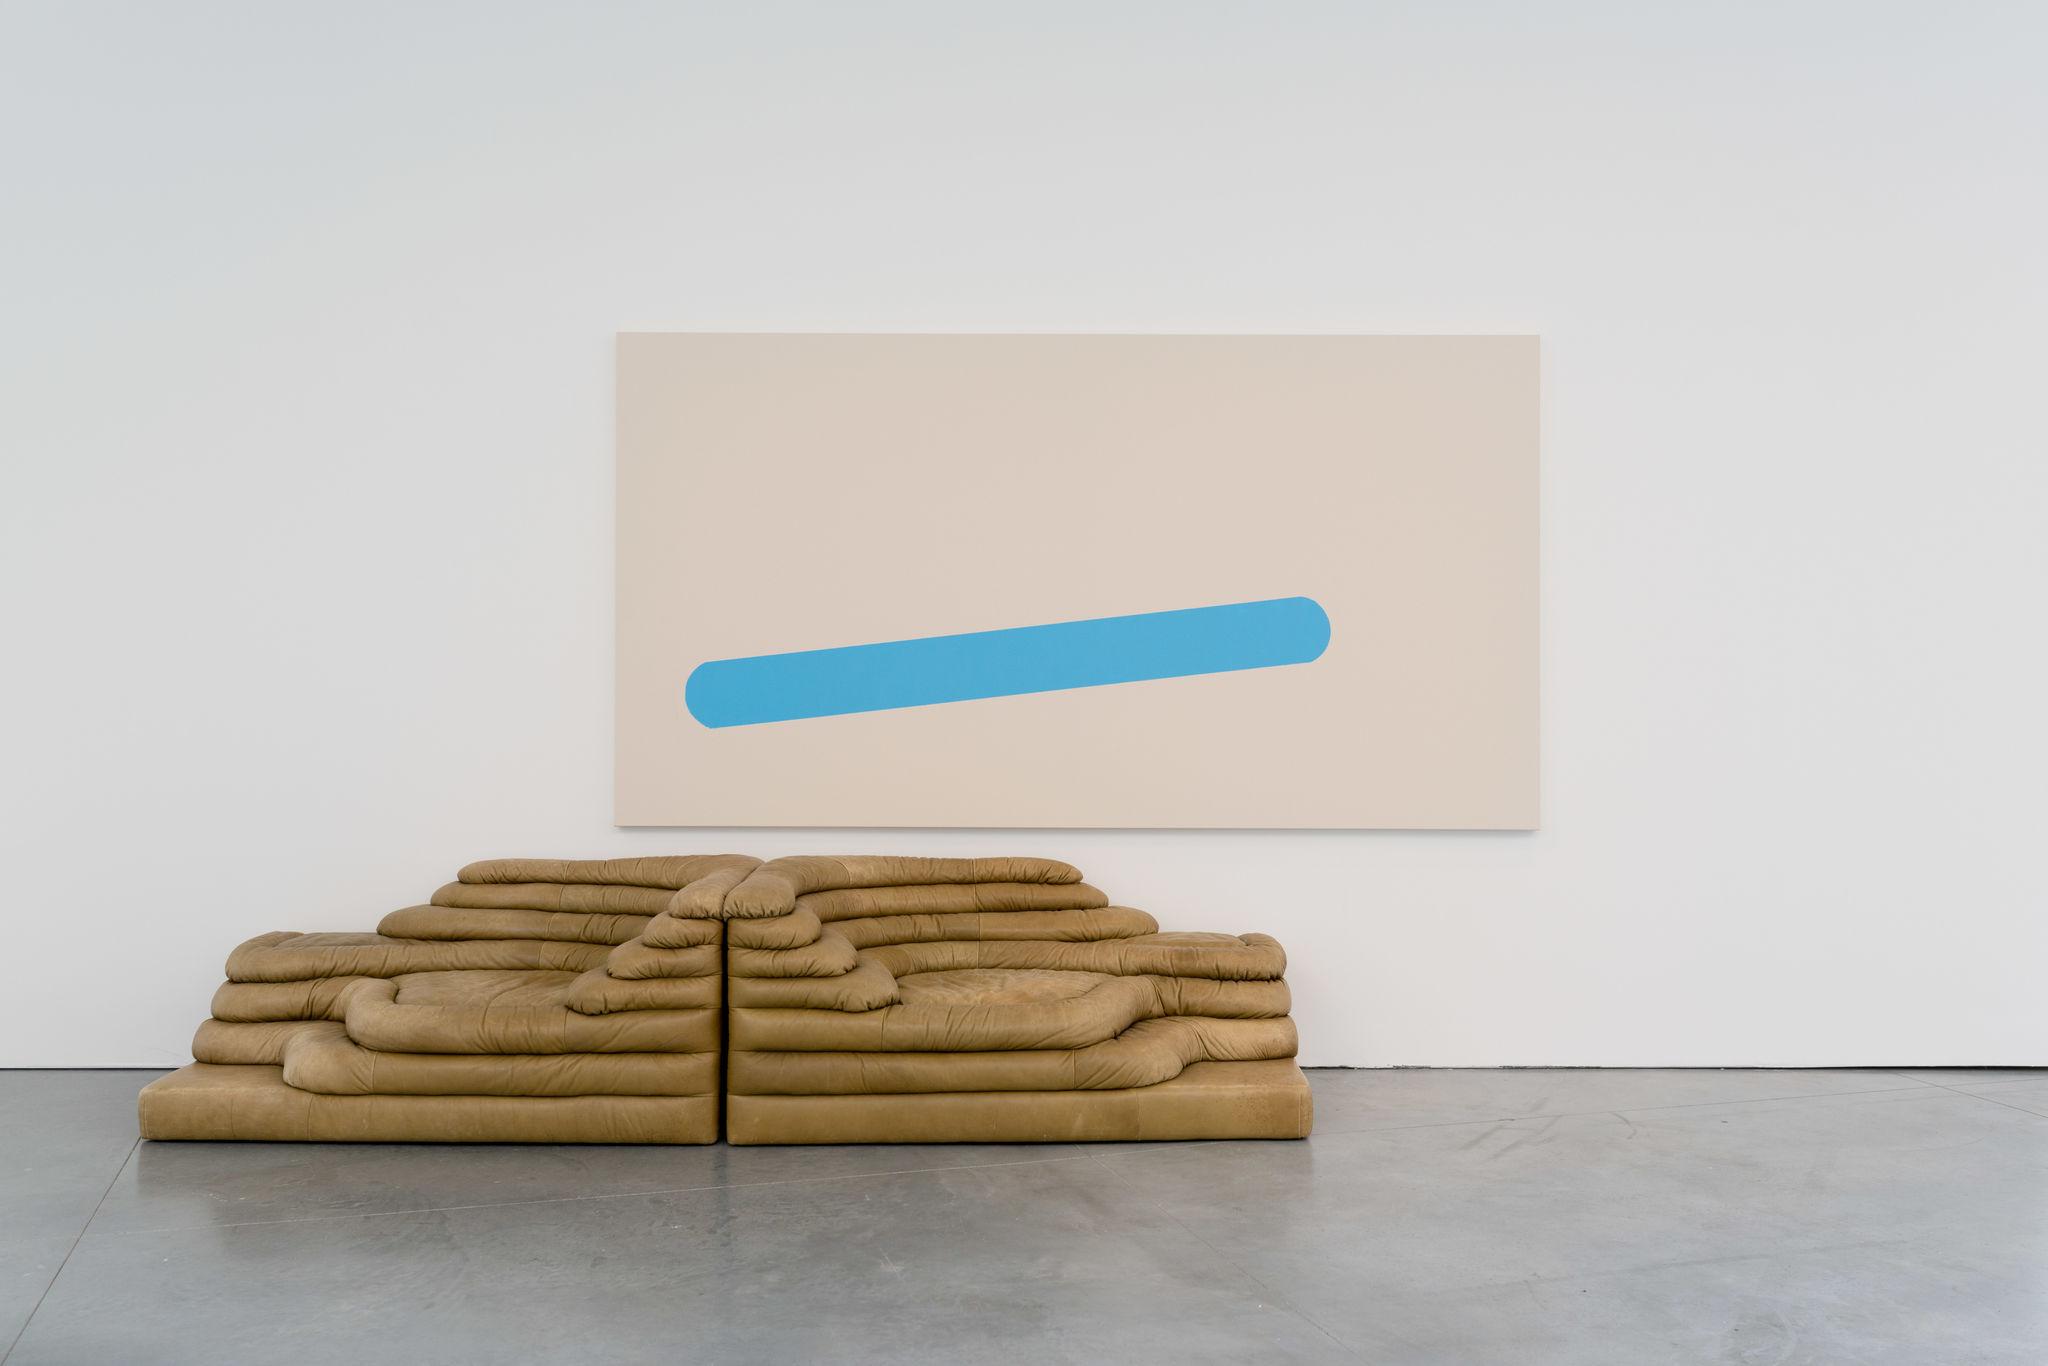 John M Armleder, Smoothie II (furniture sculpture), 2019 Acrylic on canvas, two sofas by Ubald Klug & Ueli Berger, 1972 Canvas: 150 x 280 cm - 59 x 110 1/4 in Sofa: 180 x 140 x 100 cm - 70 7/8 x 55 1/8 x 39 3/8 in (each)